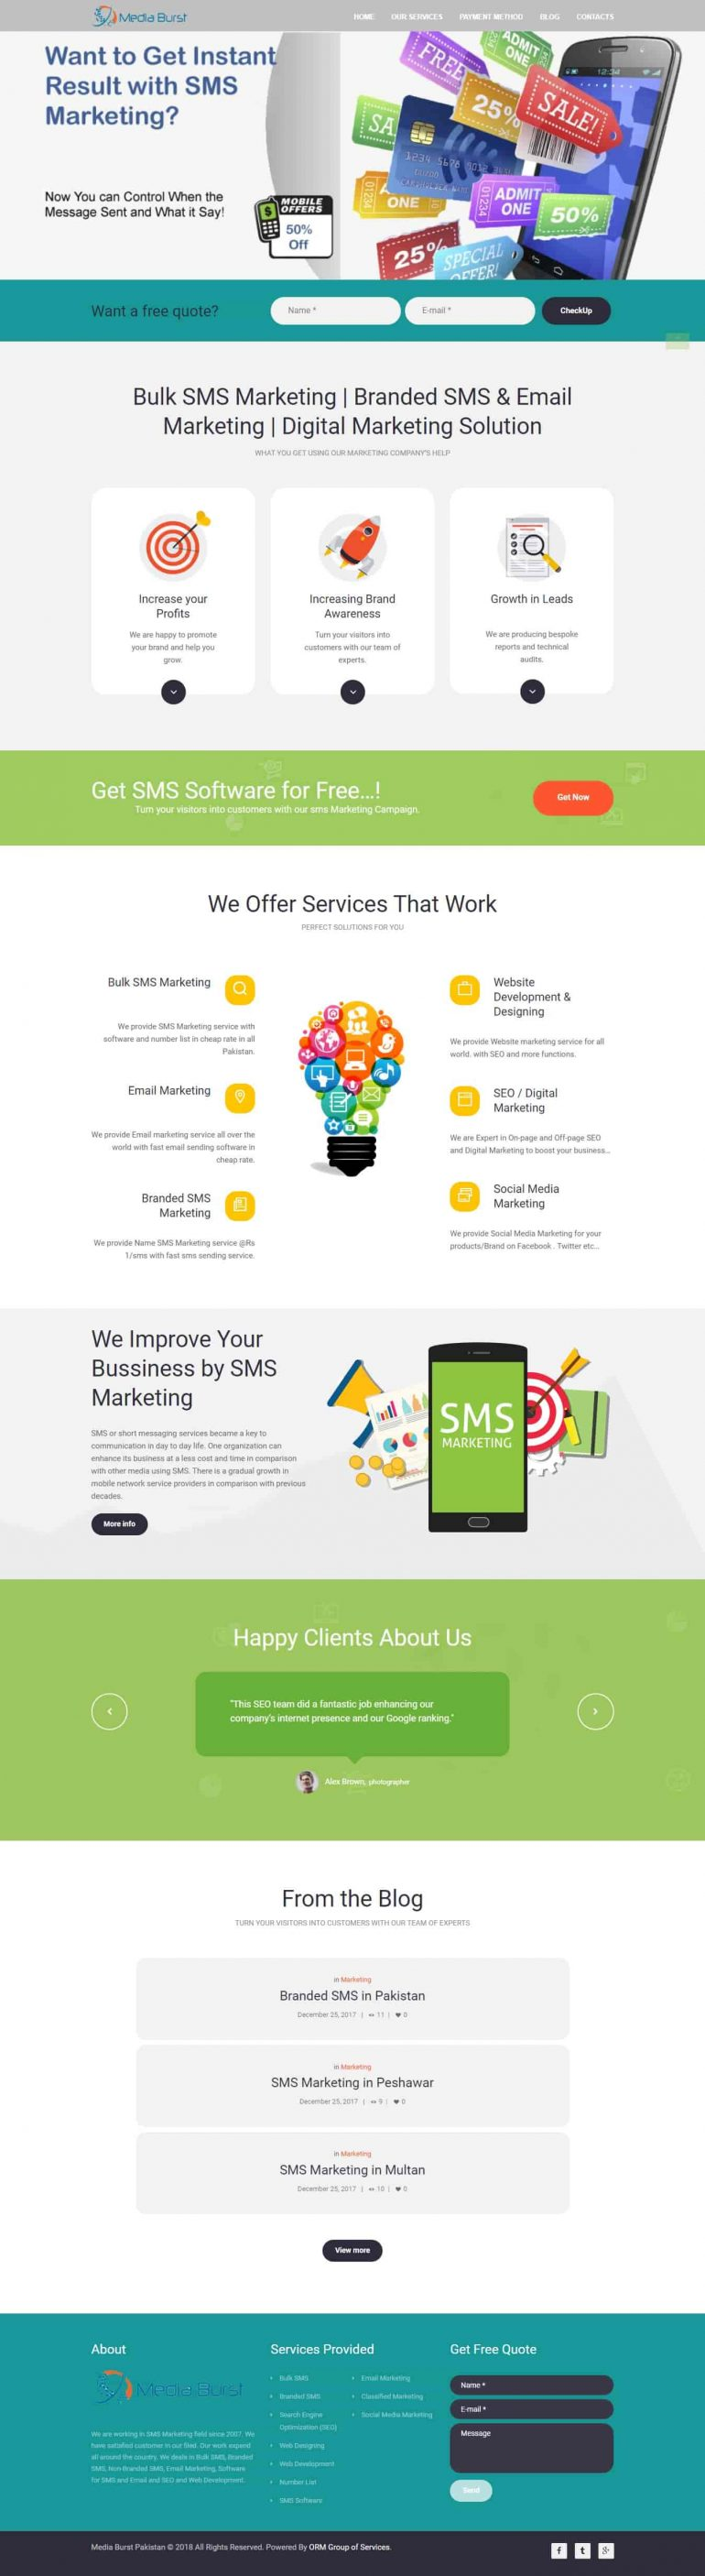 SMS Marketing in Pakistan